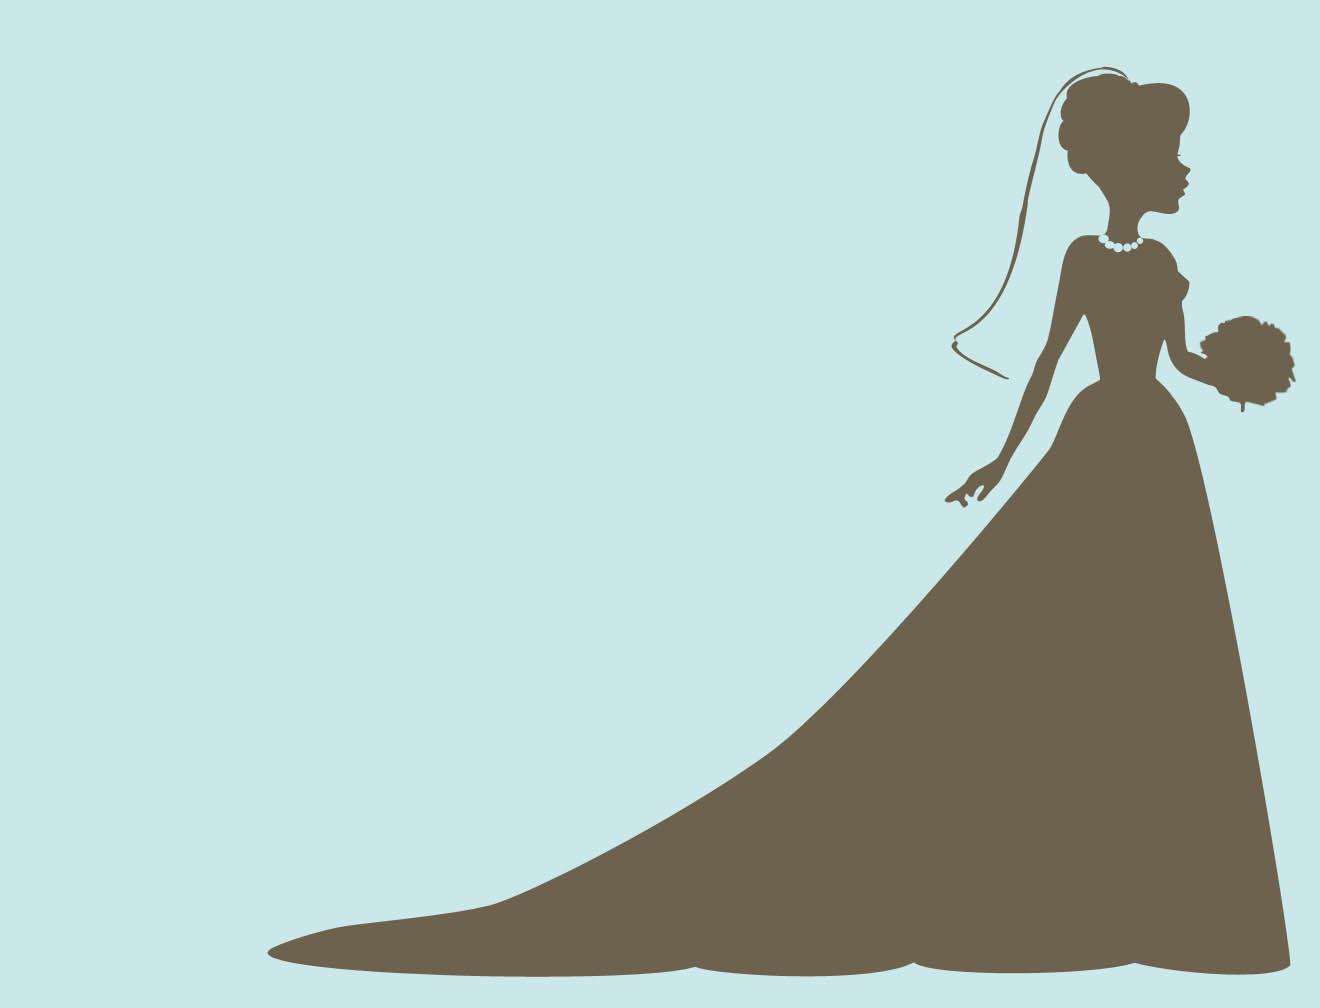 Free Wedding Shower Clip Art - ClipArt Best